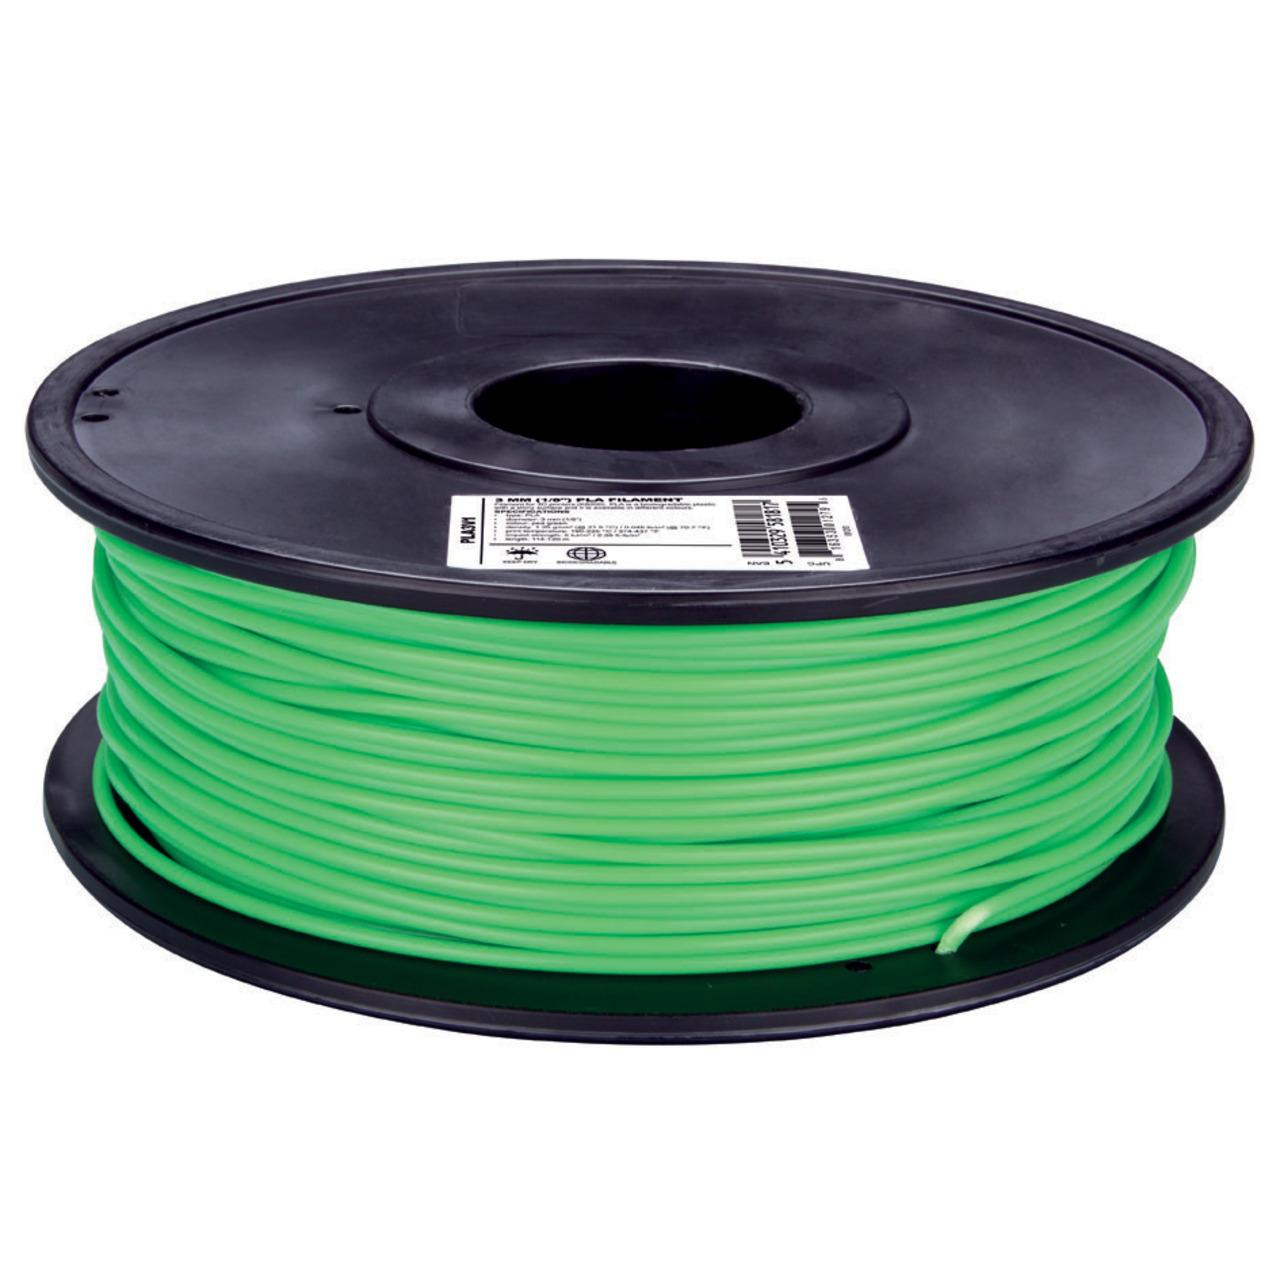 Velleman PLA Filament- hellgrün- 3 mm- 750 g- PLA3V1